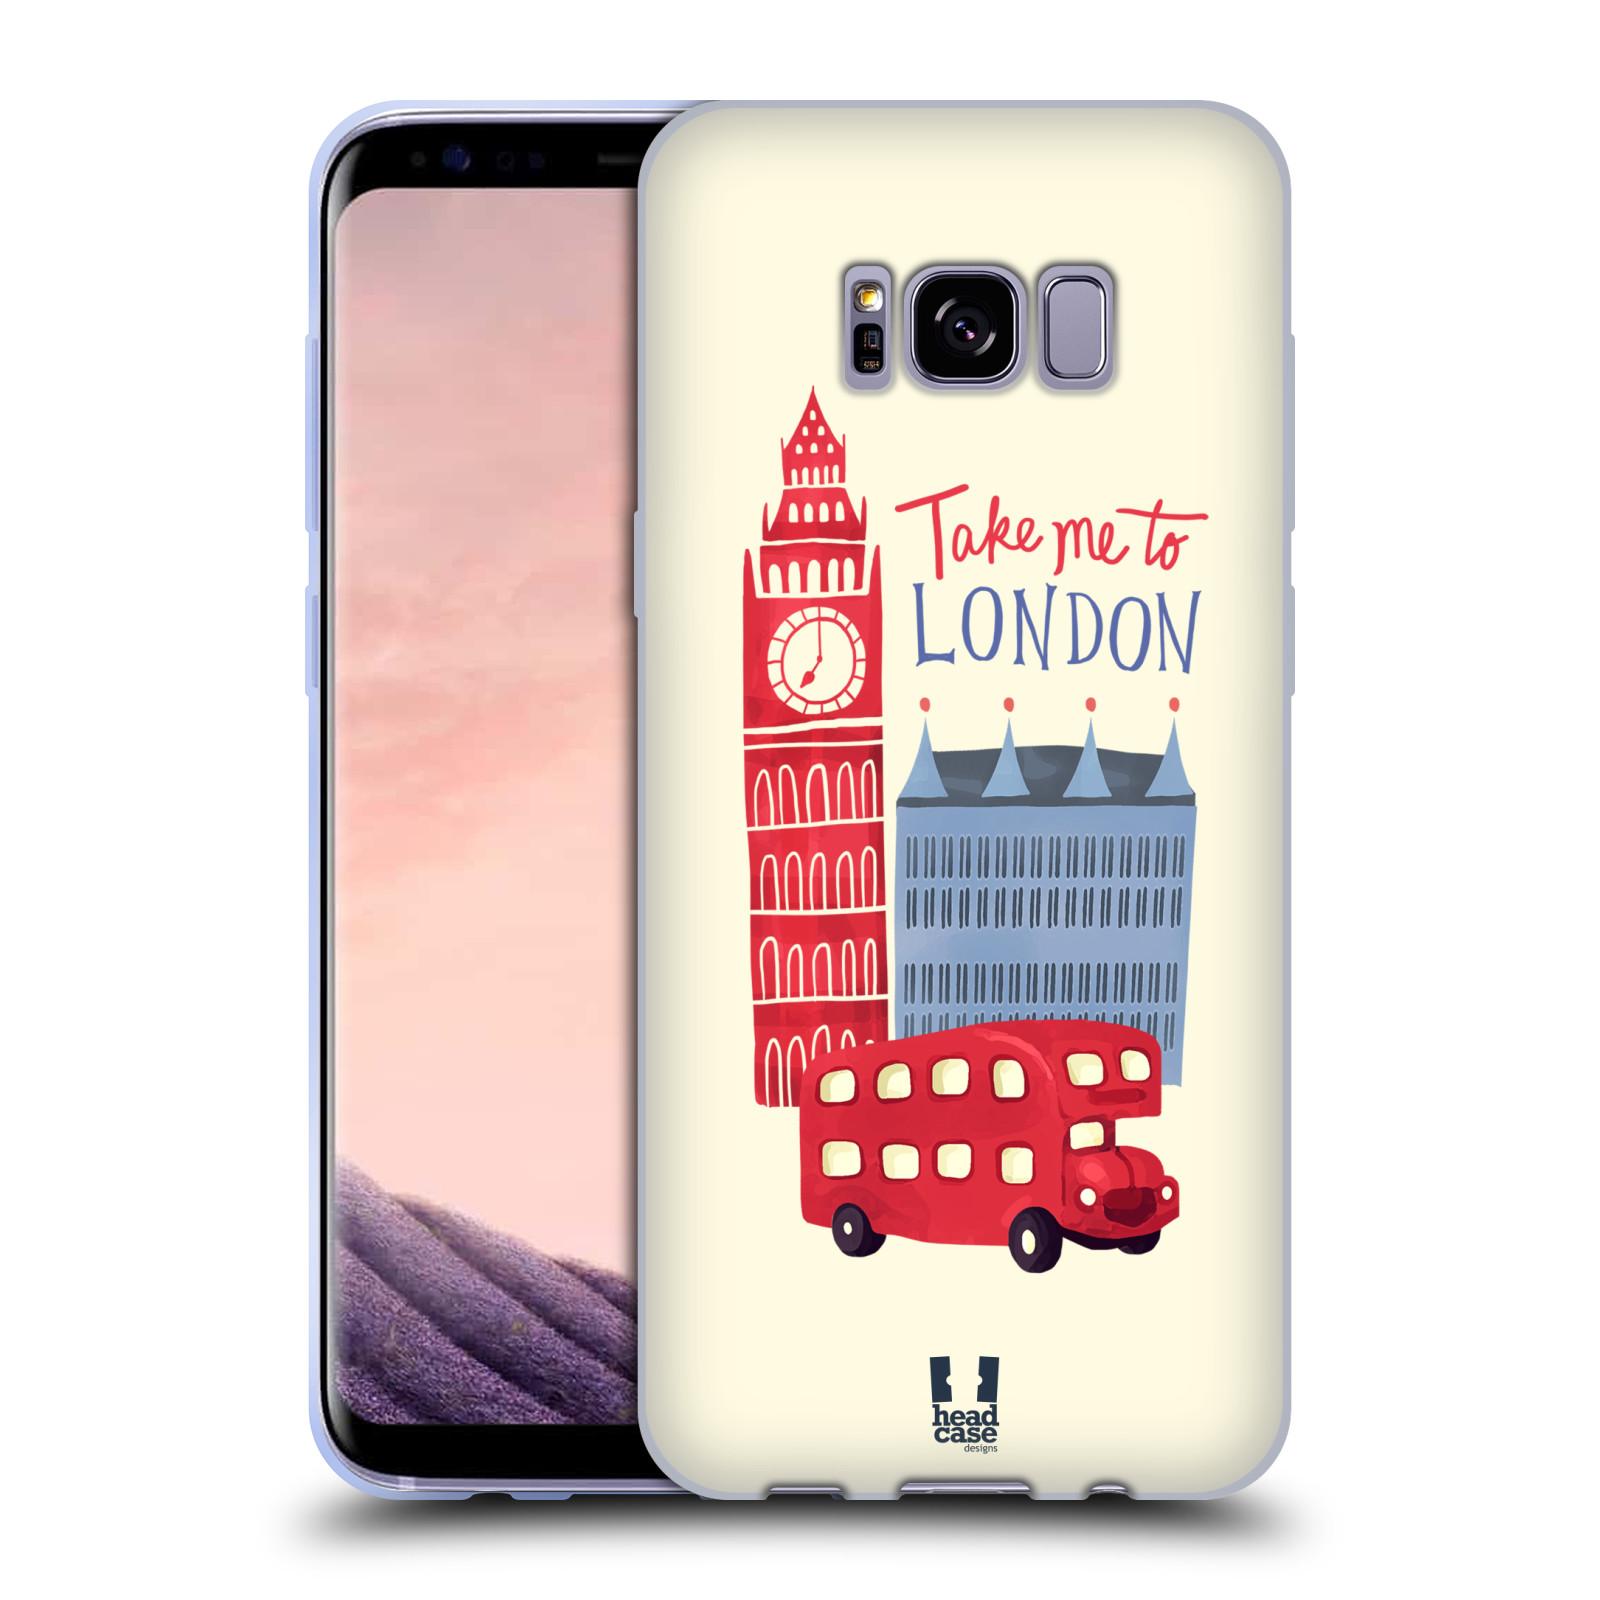 HEAD-CASE-DESIGNS-I-DREAM-OF-LONDON-SOFT-GEL-CASE-FOR-SAMSUNG-GALAXY-S8-S8-PLUS